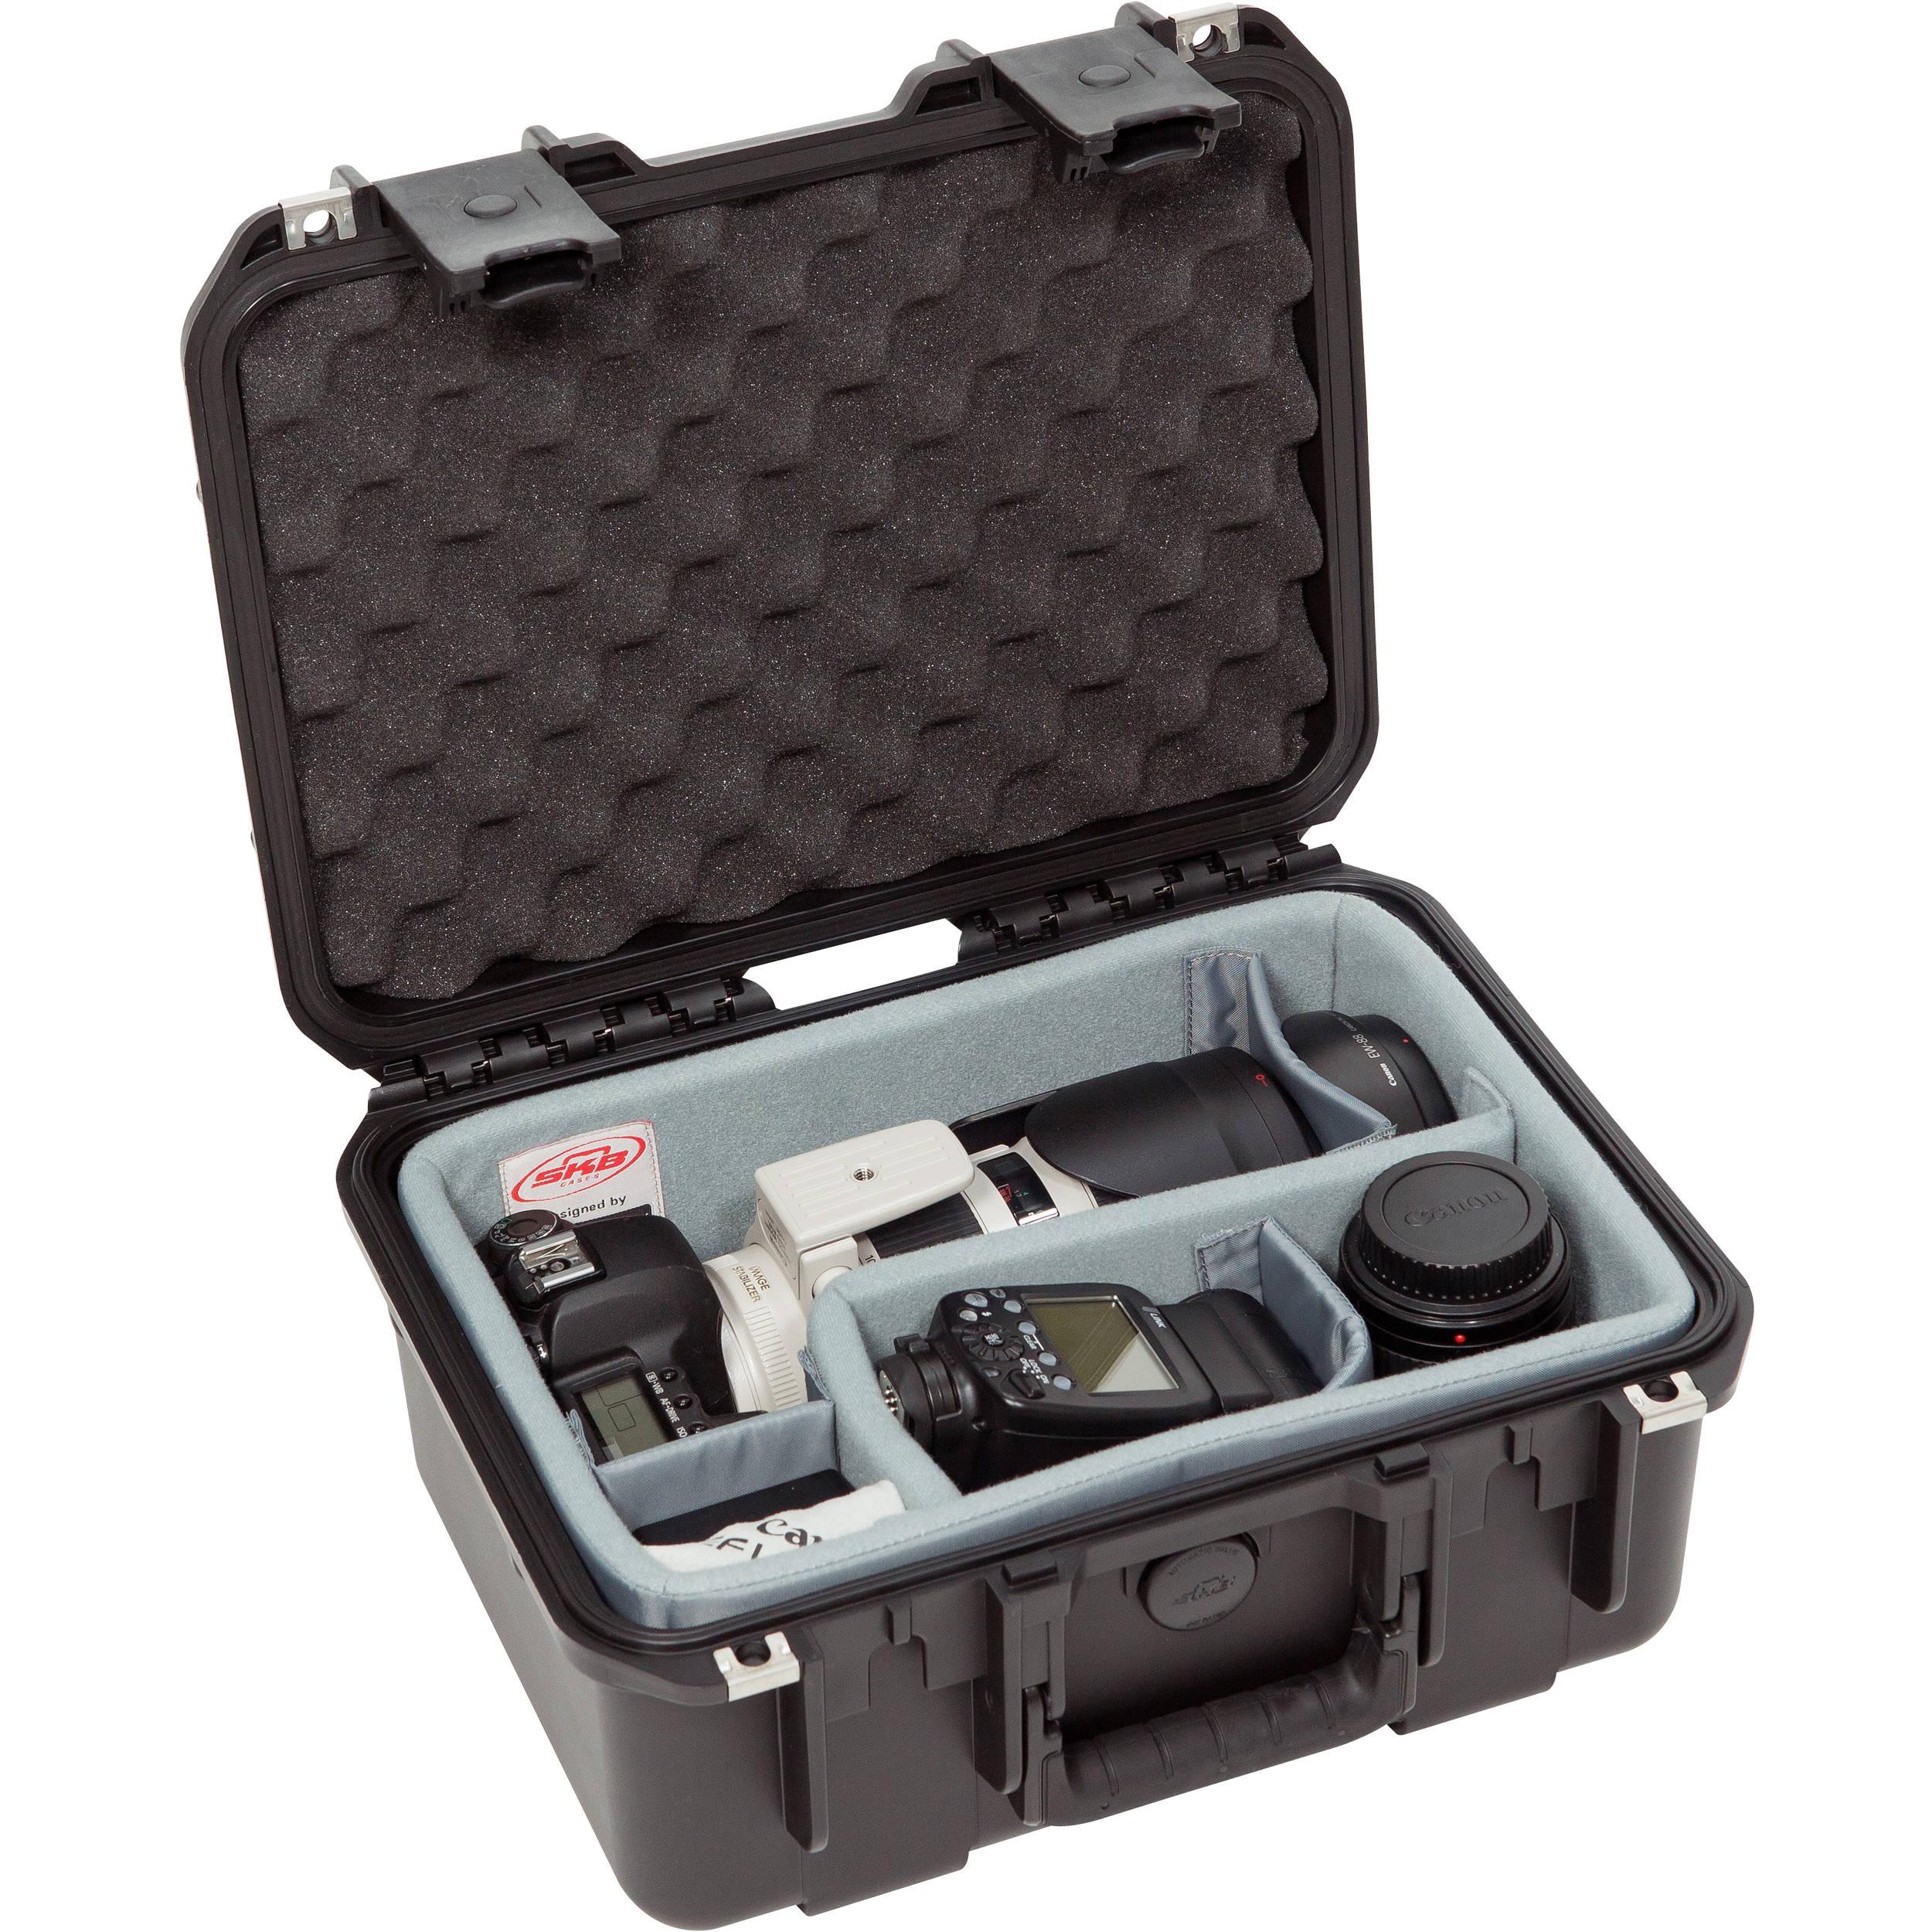 SKB Cases 3i-2015-10PT iSeries Professional Camera Case Black//Gray